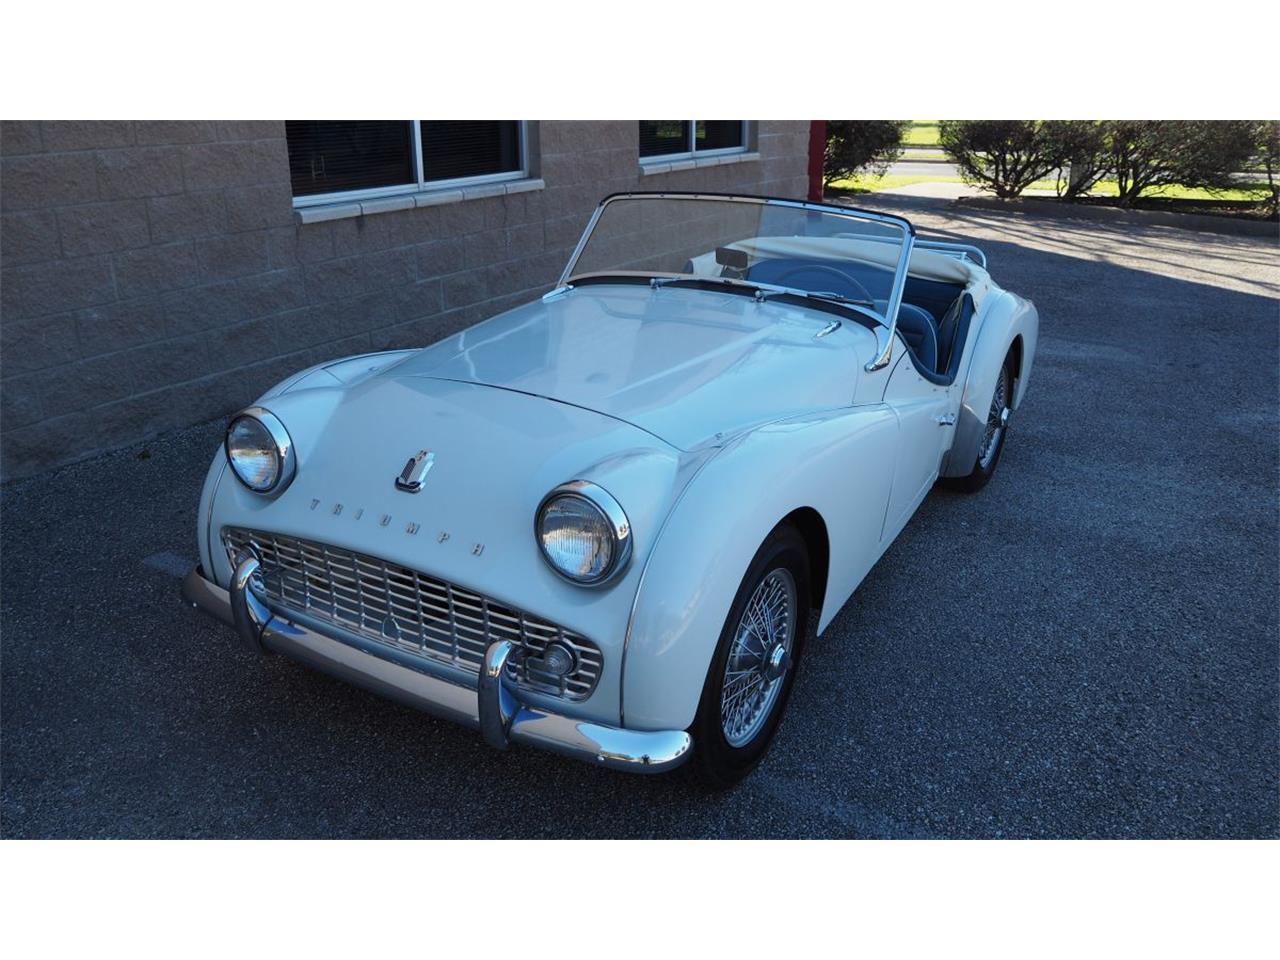 1962 Triumph Tr3a For Sale Classiccarscom Cc 970508